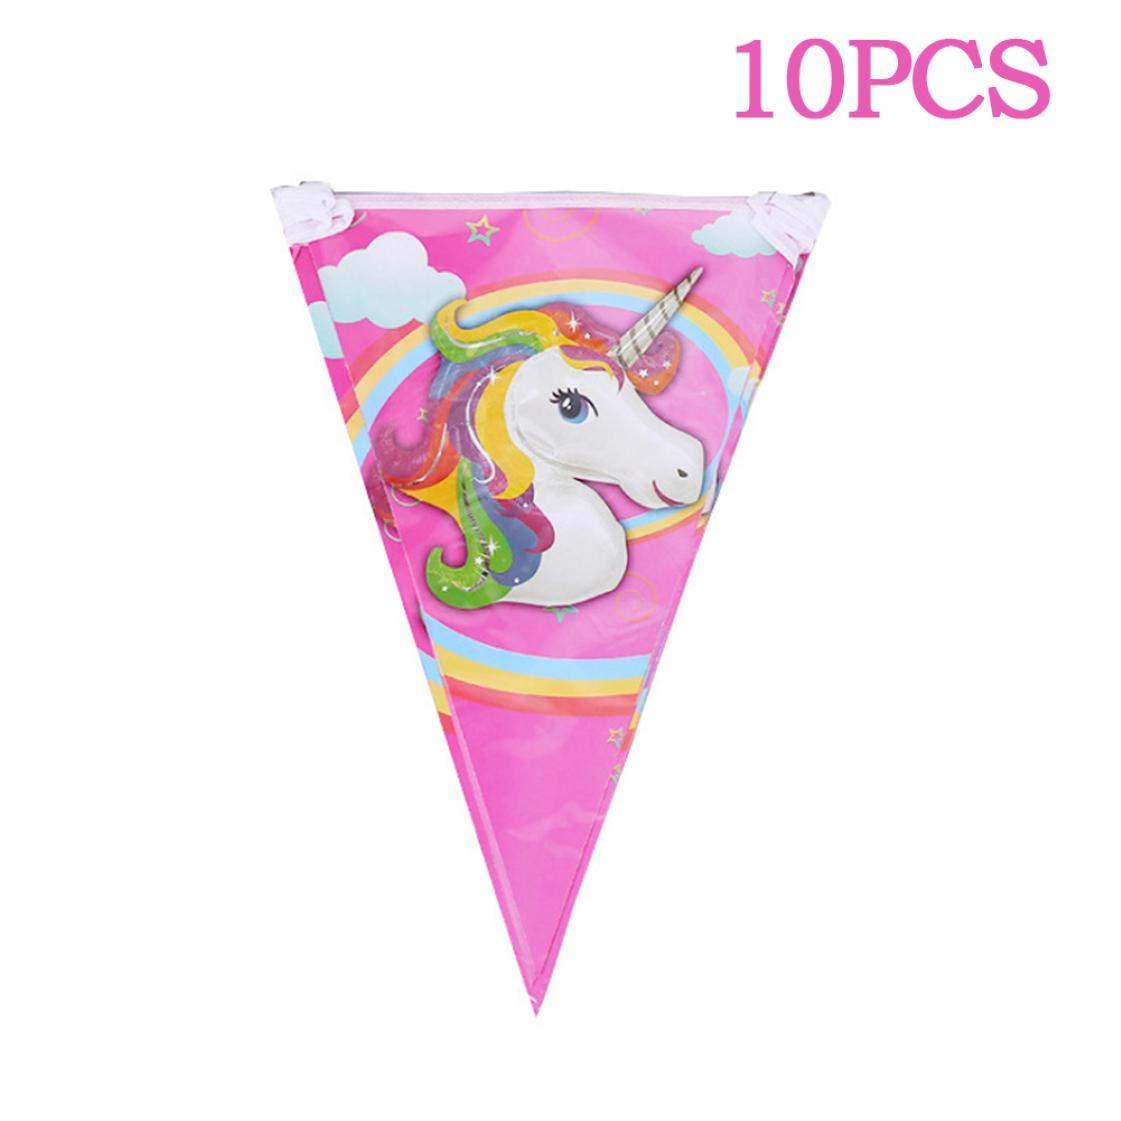 Bongles Decoraci/ón Partido del Unicornio Unicornio 10pcs Fiesta De Cumplea/ños del Unicornio De Paja Tema De La Historieta Decoraci/ón del Partido